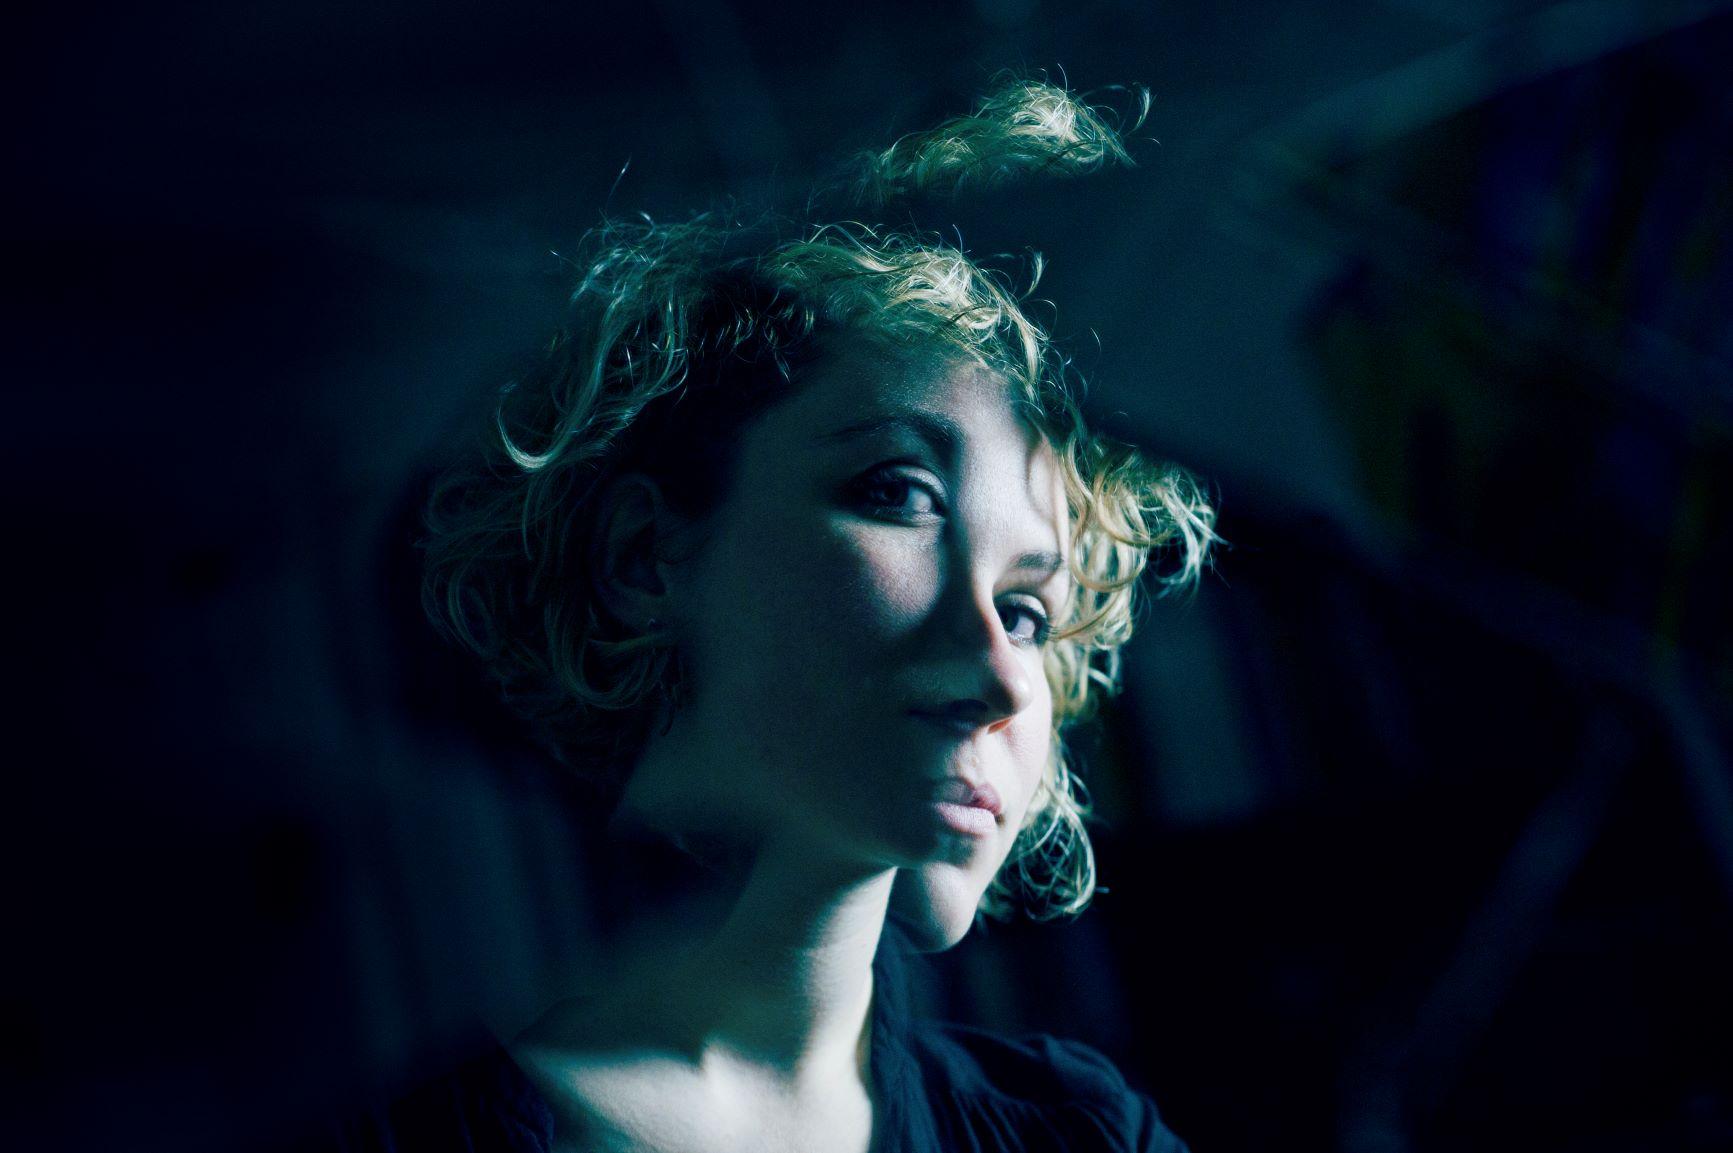 Laura Perrudin crédit photo Jean-Baptiste Millot